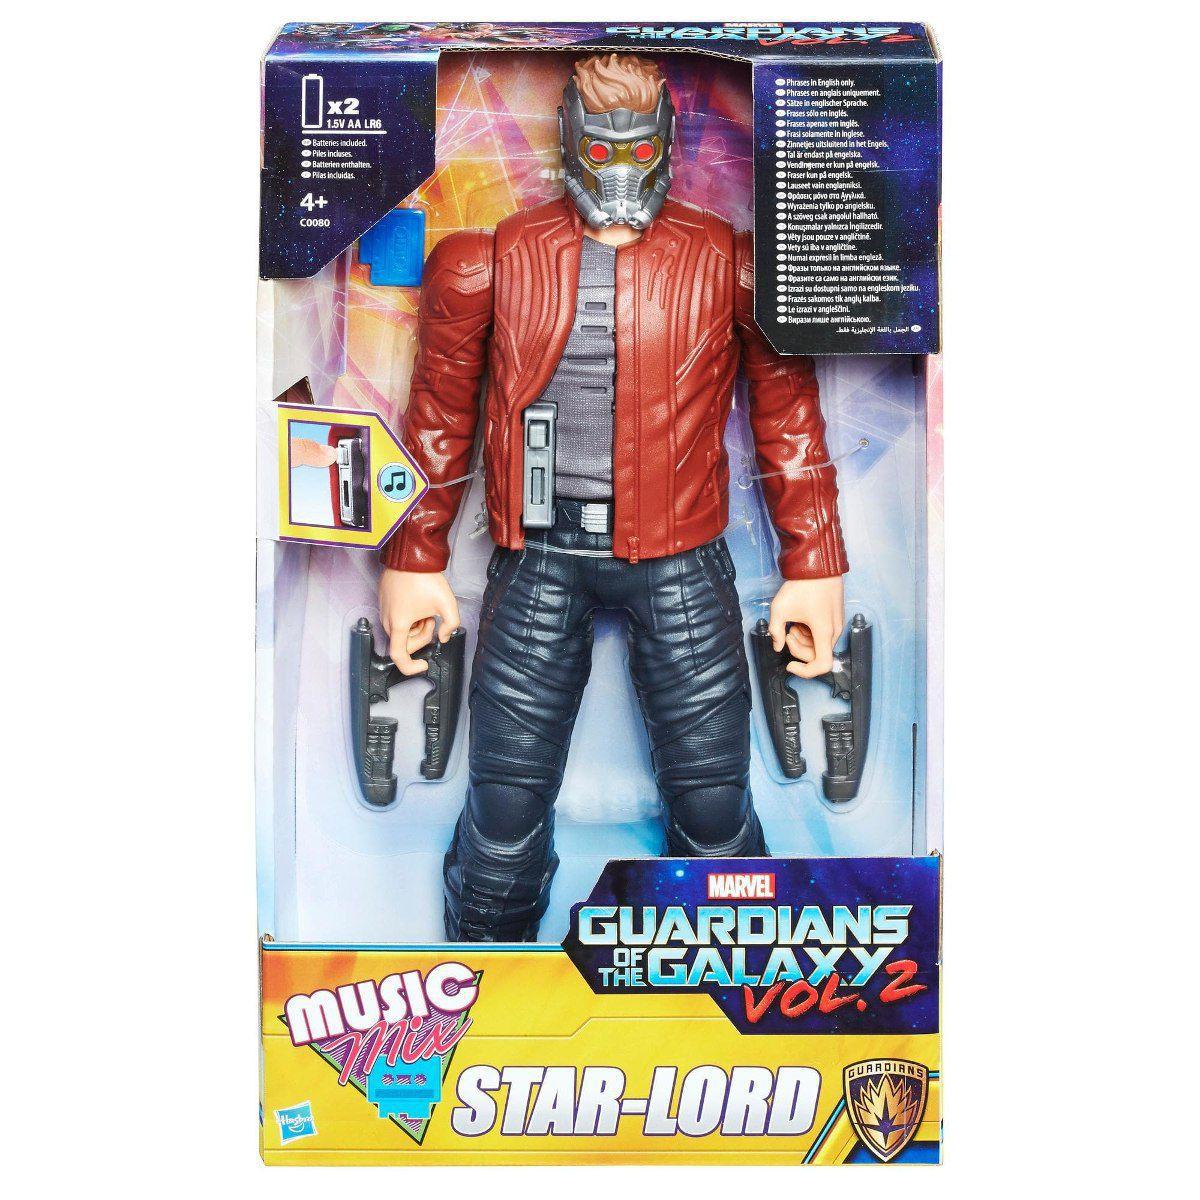 Boneco Star Lord Eletrônico Music Mix - Guardiões da Galaxia  C0080 - Hasbro